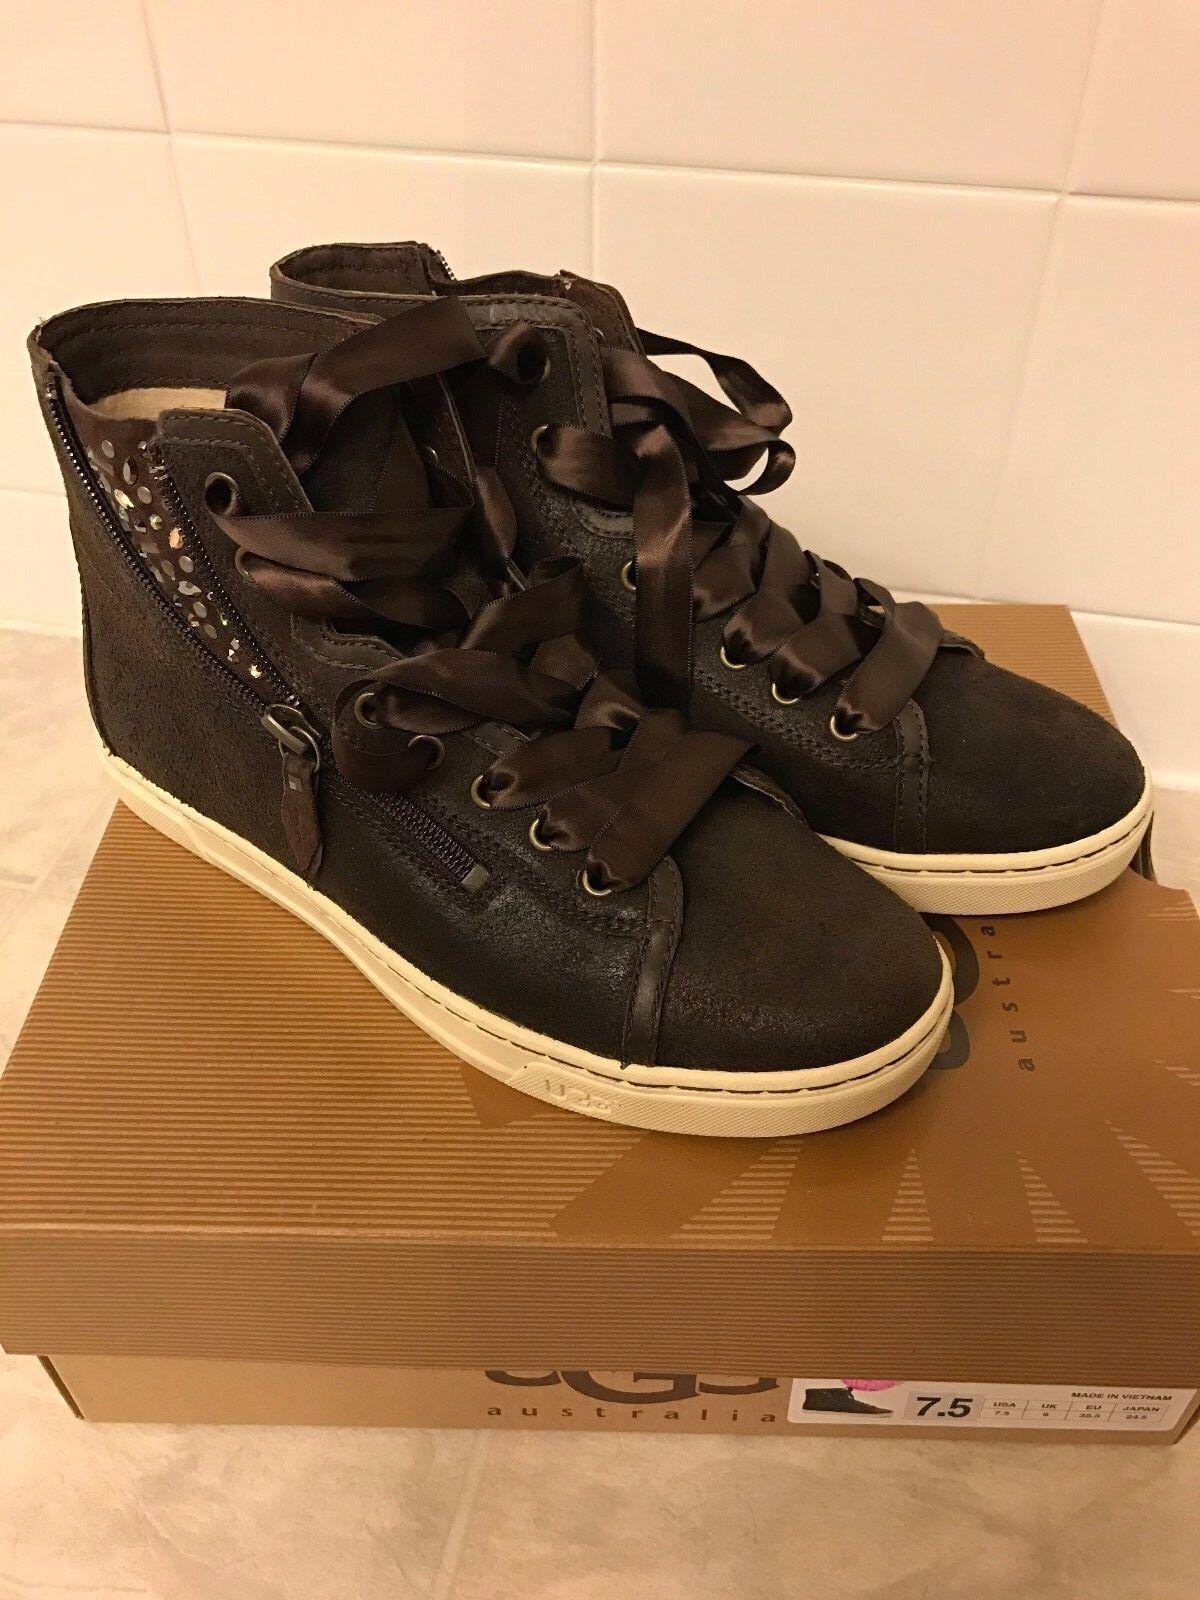 UGG Australia BLANEY CRYSTALS Chocolate Sneakers mit Schnürung